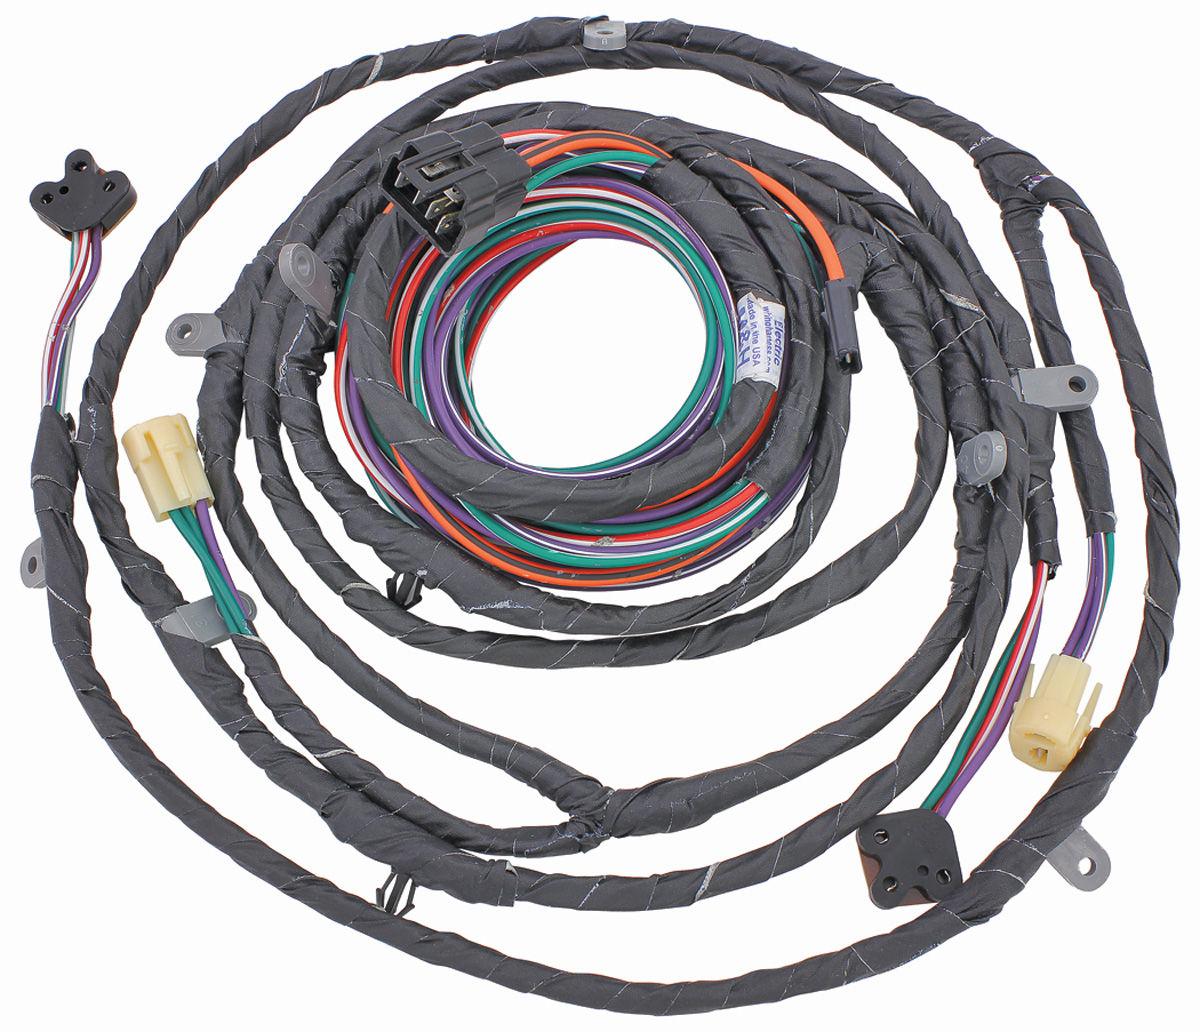 M&H GTO Power Window Harness Quarter Window & intermediate harness  Gto Wiring Harness on pontiac g6 headlight harness, gto power steering pump, gto engine, gto driveshaft, gto motor, gto body harness,